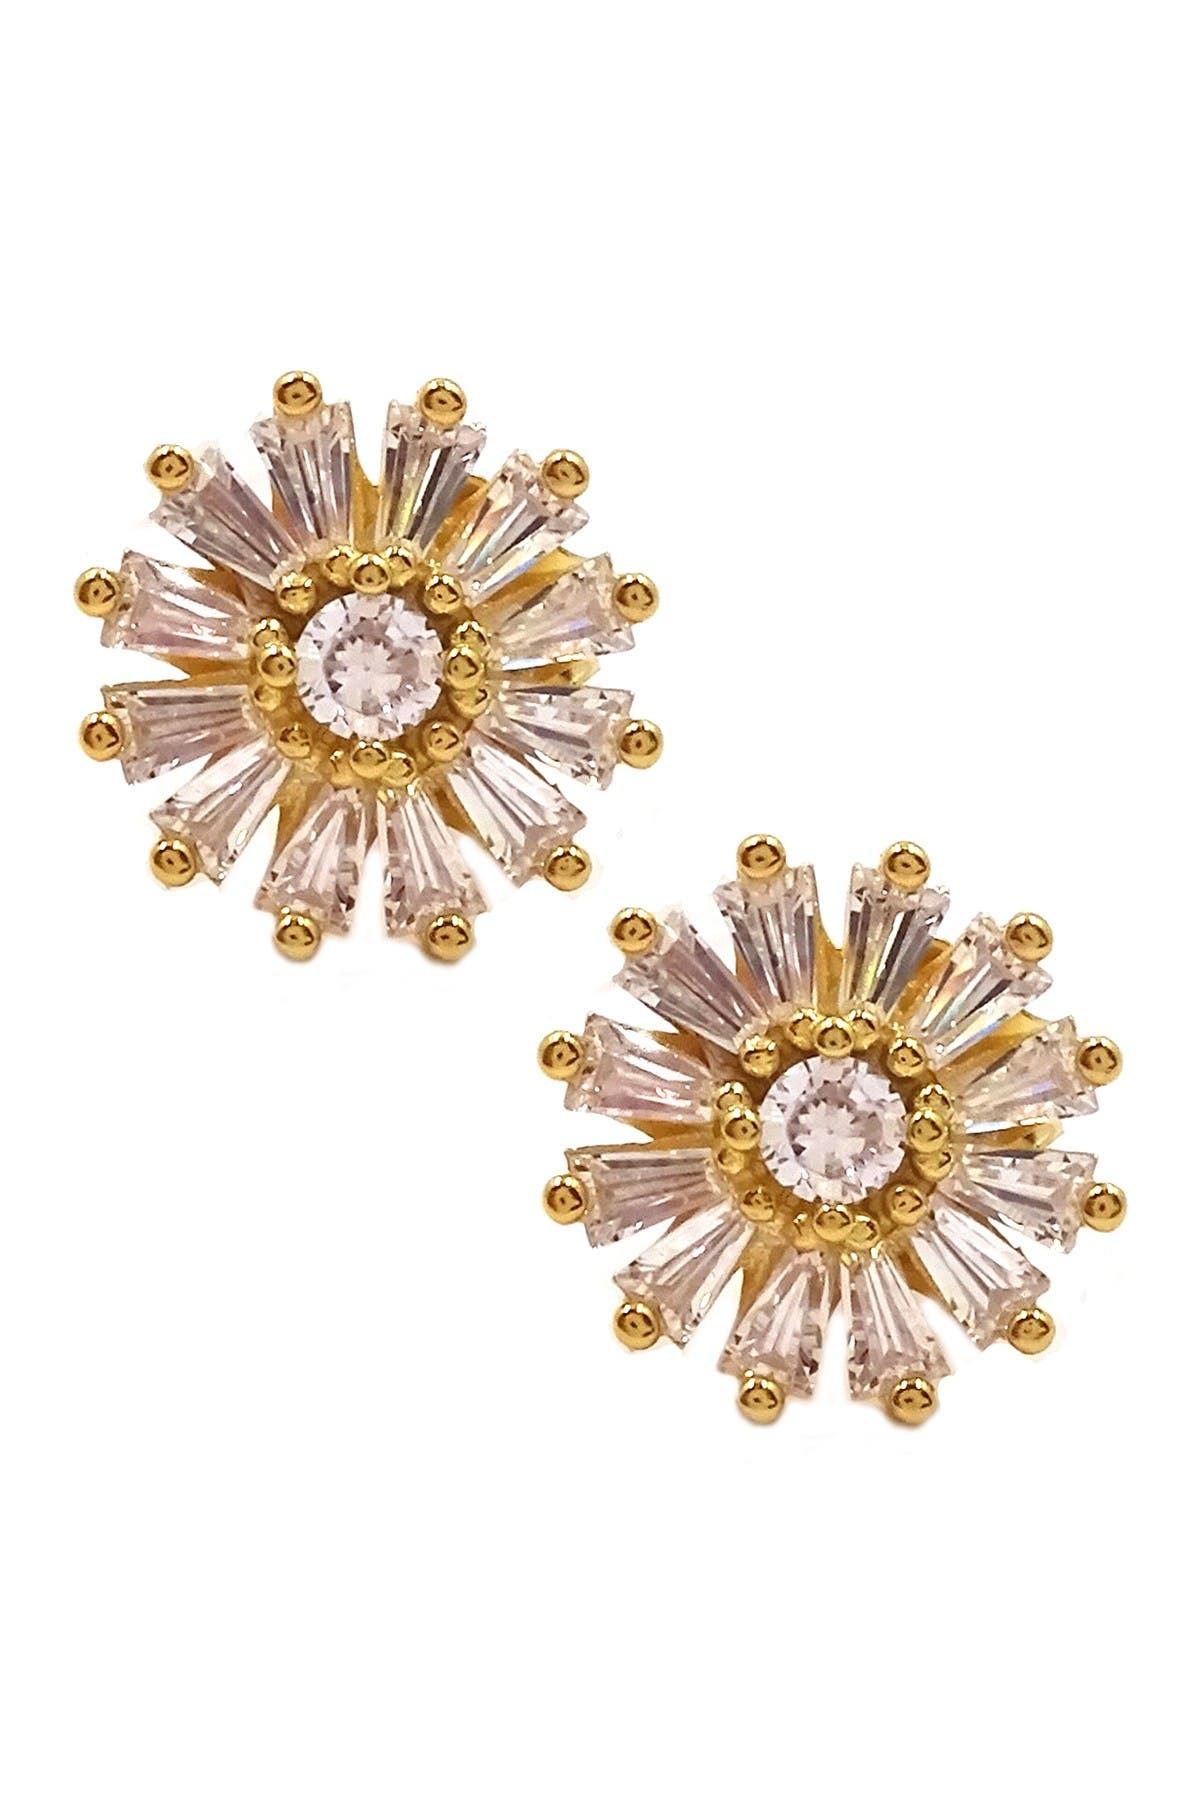 Image of Savvy Cie 18K Gold Vermeil CZ Starburst Tapered Baguette Earrings